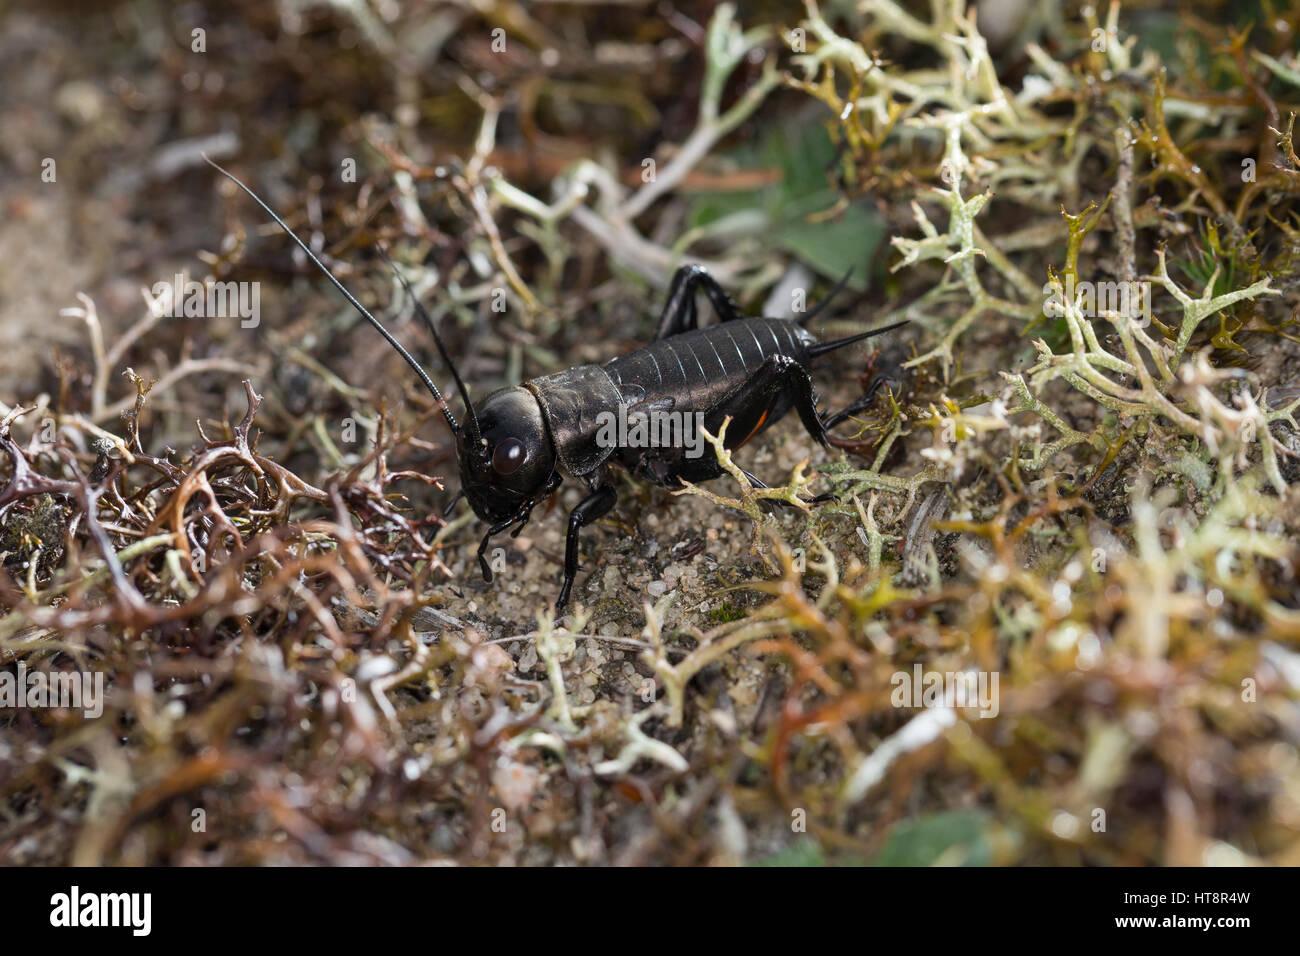 Feldgrille, larve, Nymphe, Feld-Grille, calandra, Gryllus campestris, campo cricket, calandra, Grillen, Gryllidae, Immagini Stock